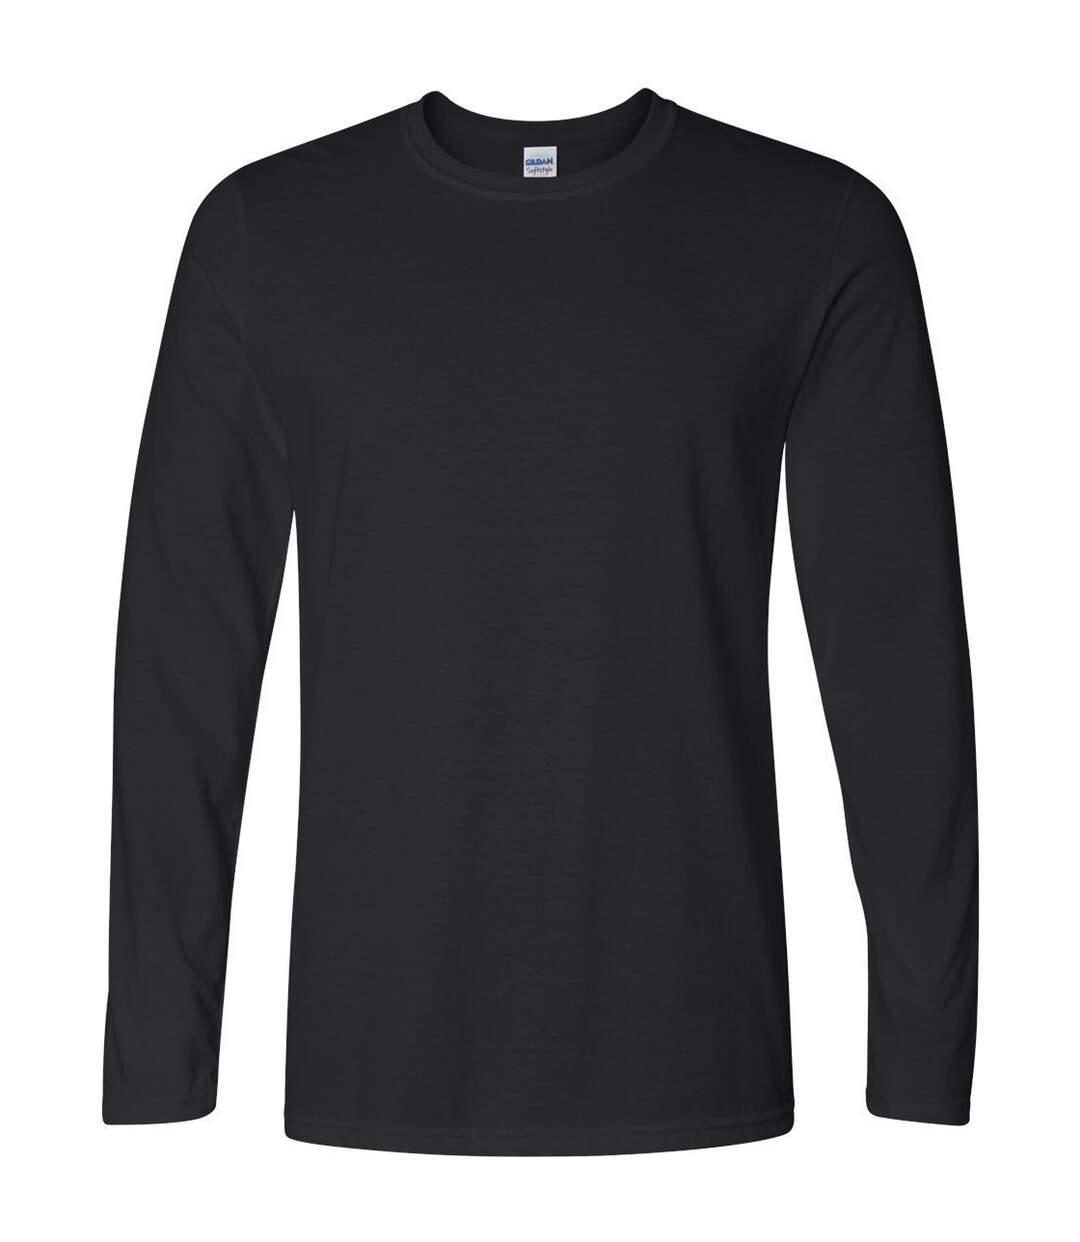 Gildan Mens Soft Style Long Sleeve T-Shirt (Black) - UTBC488